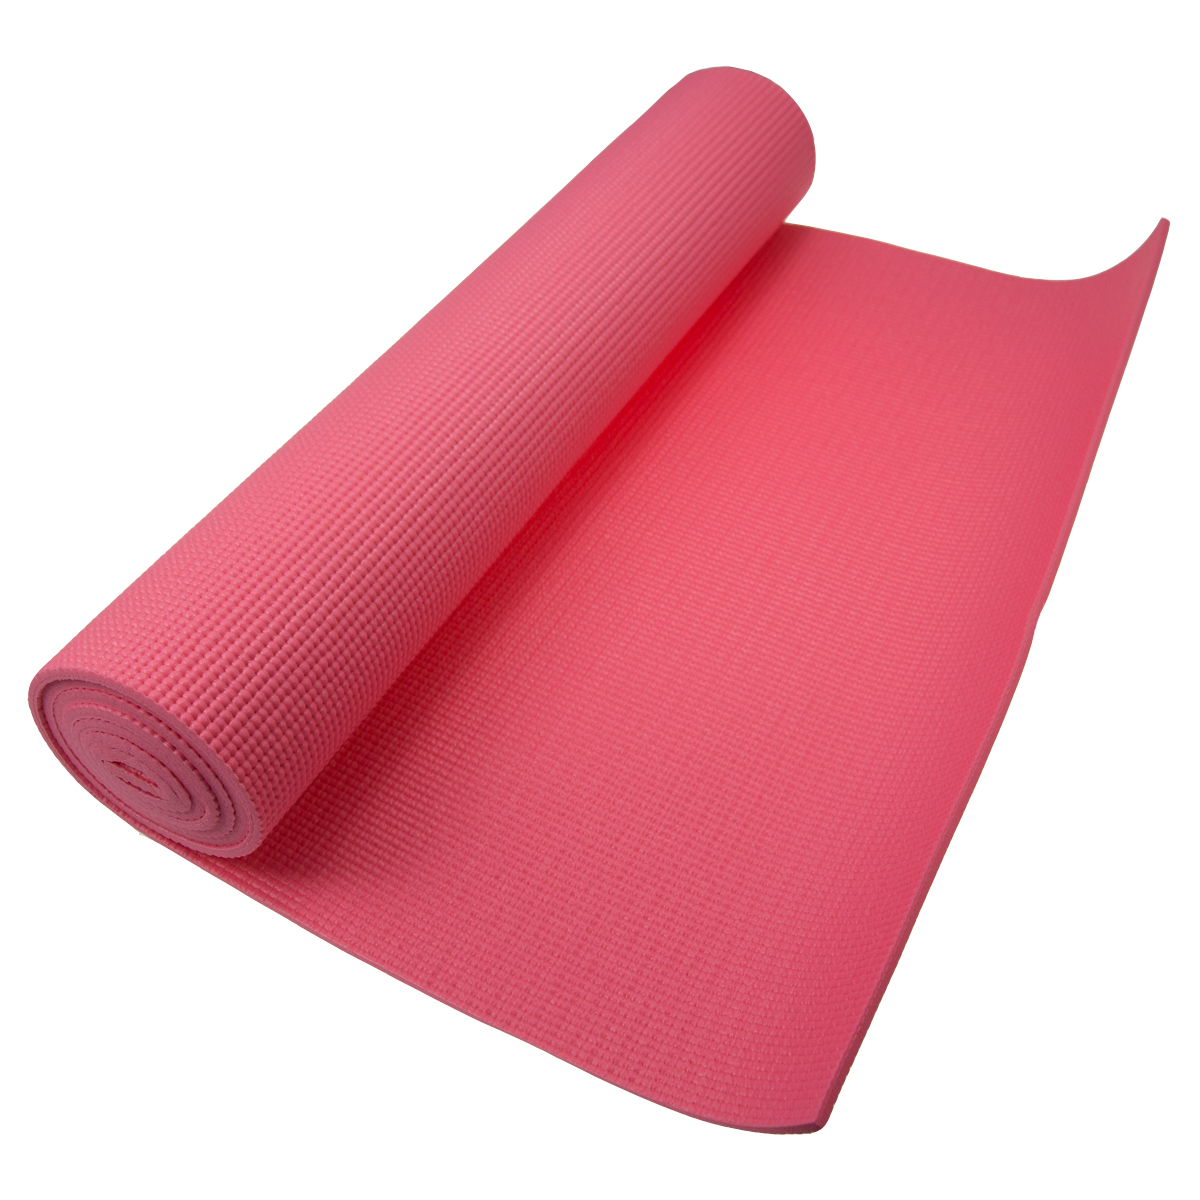 Eva Foam Yoga Mat 7mm Thick Soft Non-Slip Eco-Friendly Equipment For Men Women�Exercise Fitness by Performanz